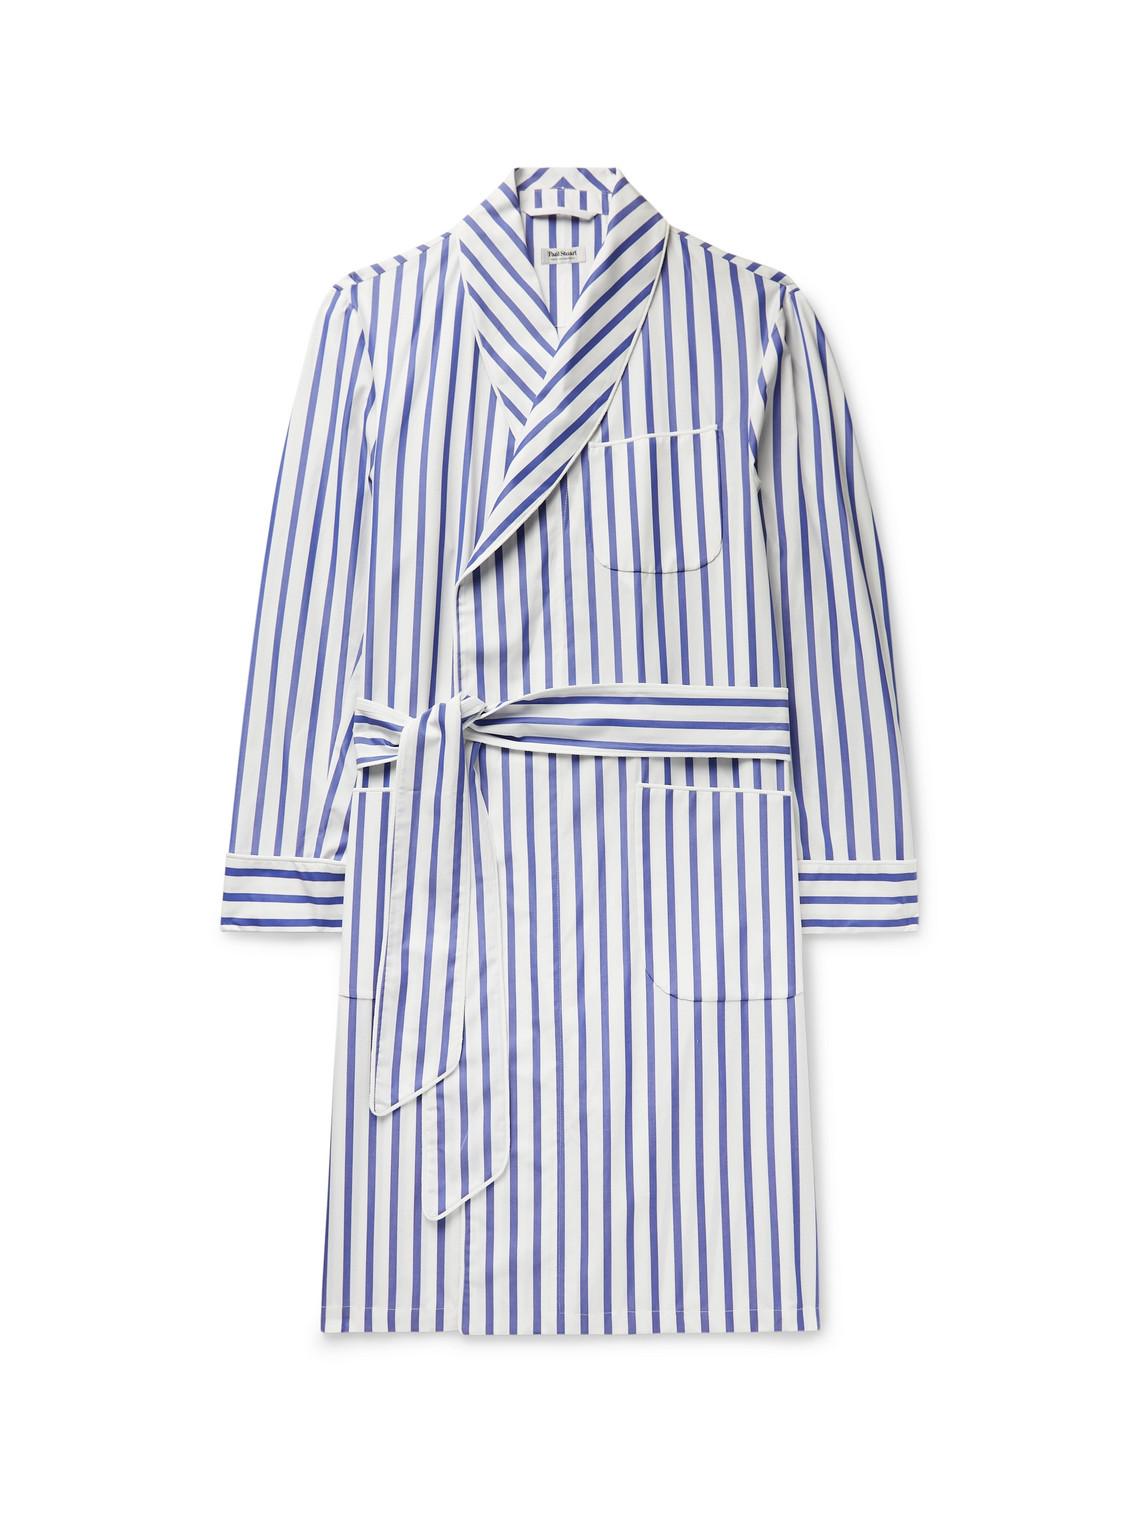 paul stuart - piped striped cotton-broadcloth robe - men - blue - m